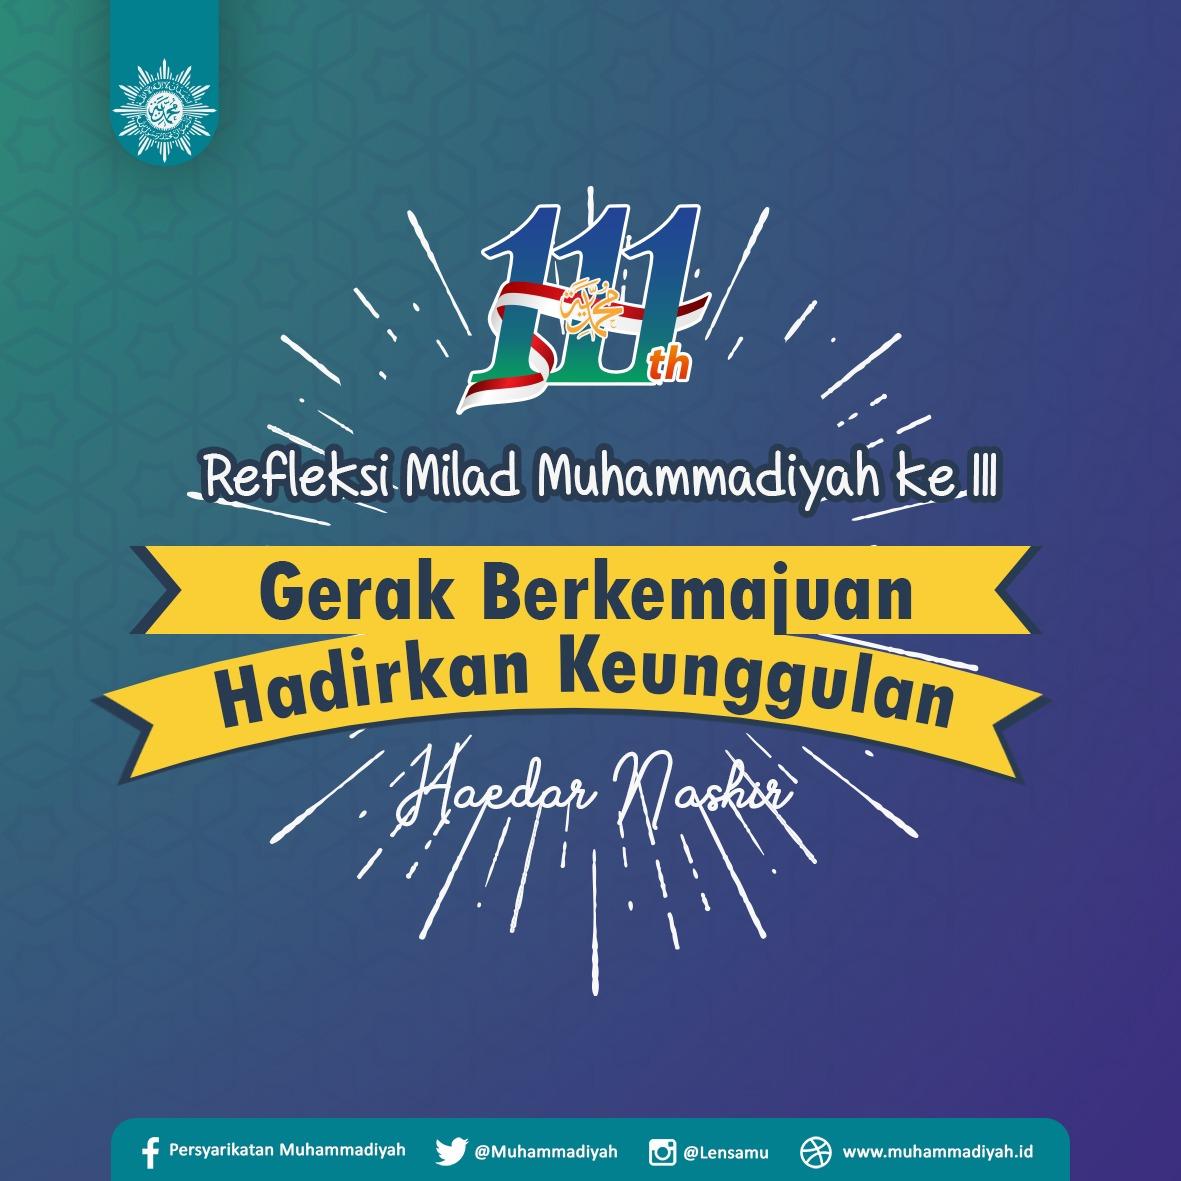 Refleksi Milad ke 111 Muhammadiyah: Gerak Berkemajuan, Hadirkan Keunggulan https://t.co/rb6rEwRvSC